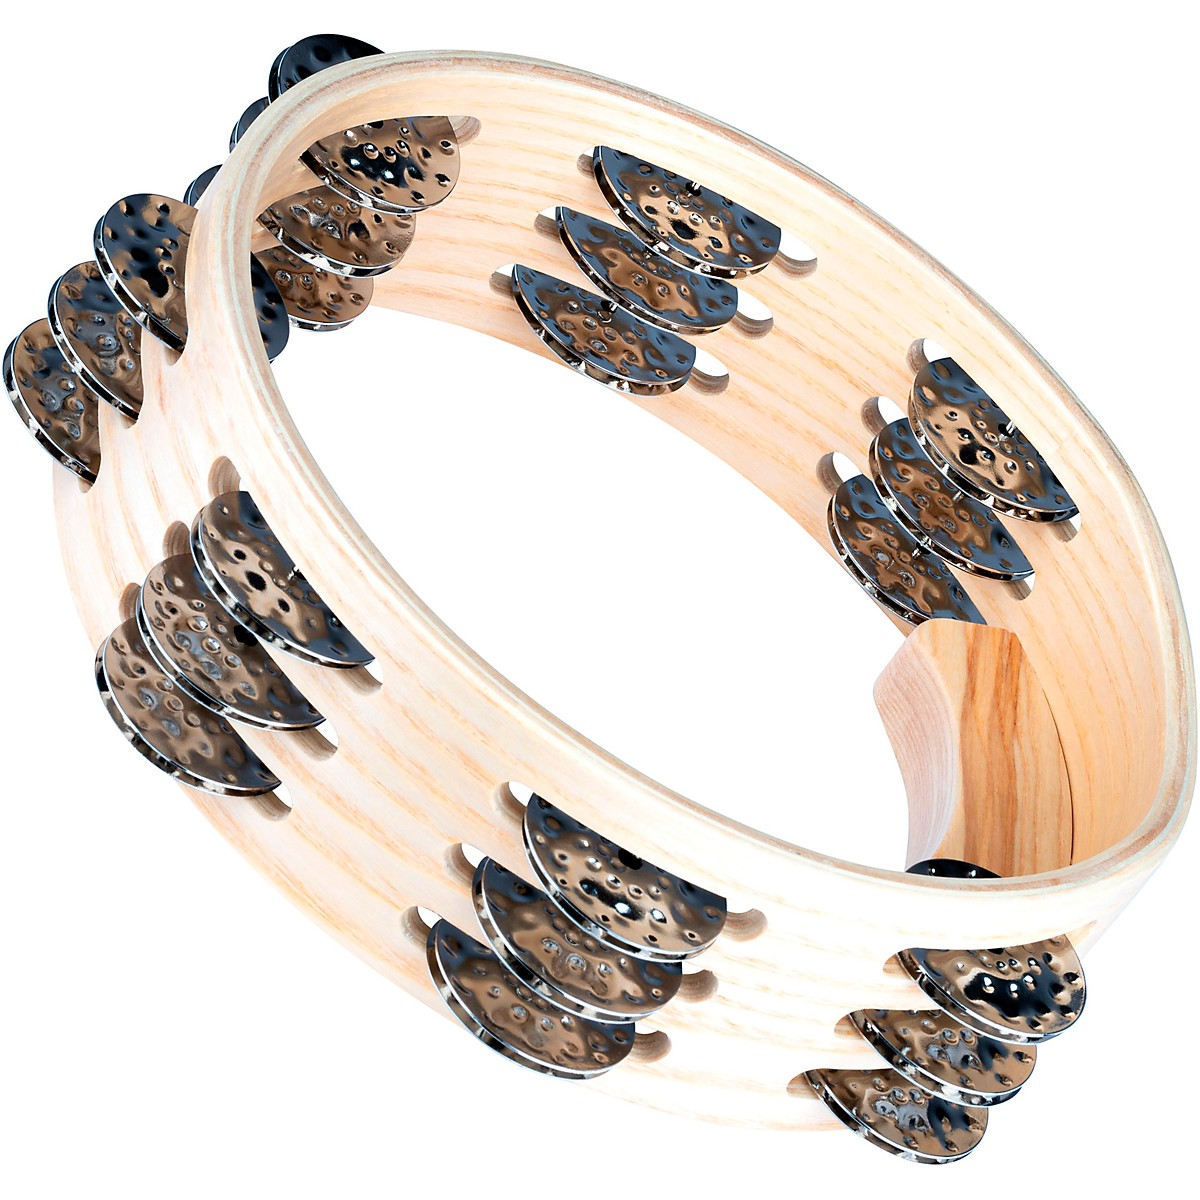 Meinl Artisan Edition Compact Tambourine with Steel Jingles 3 Row